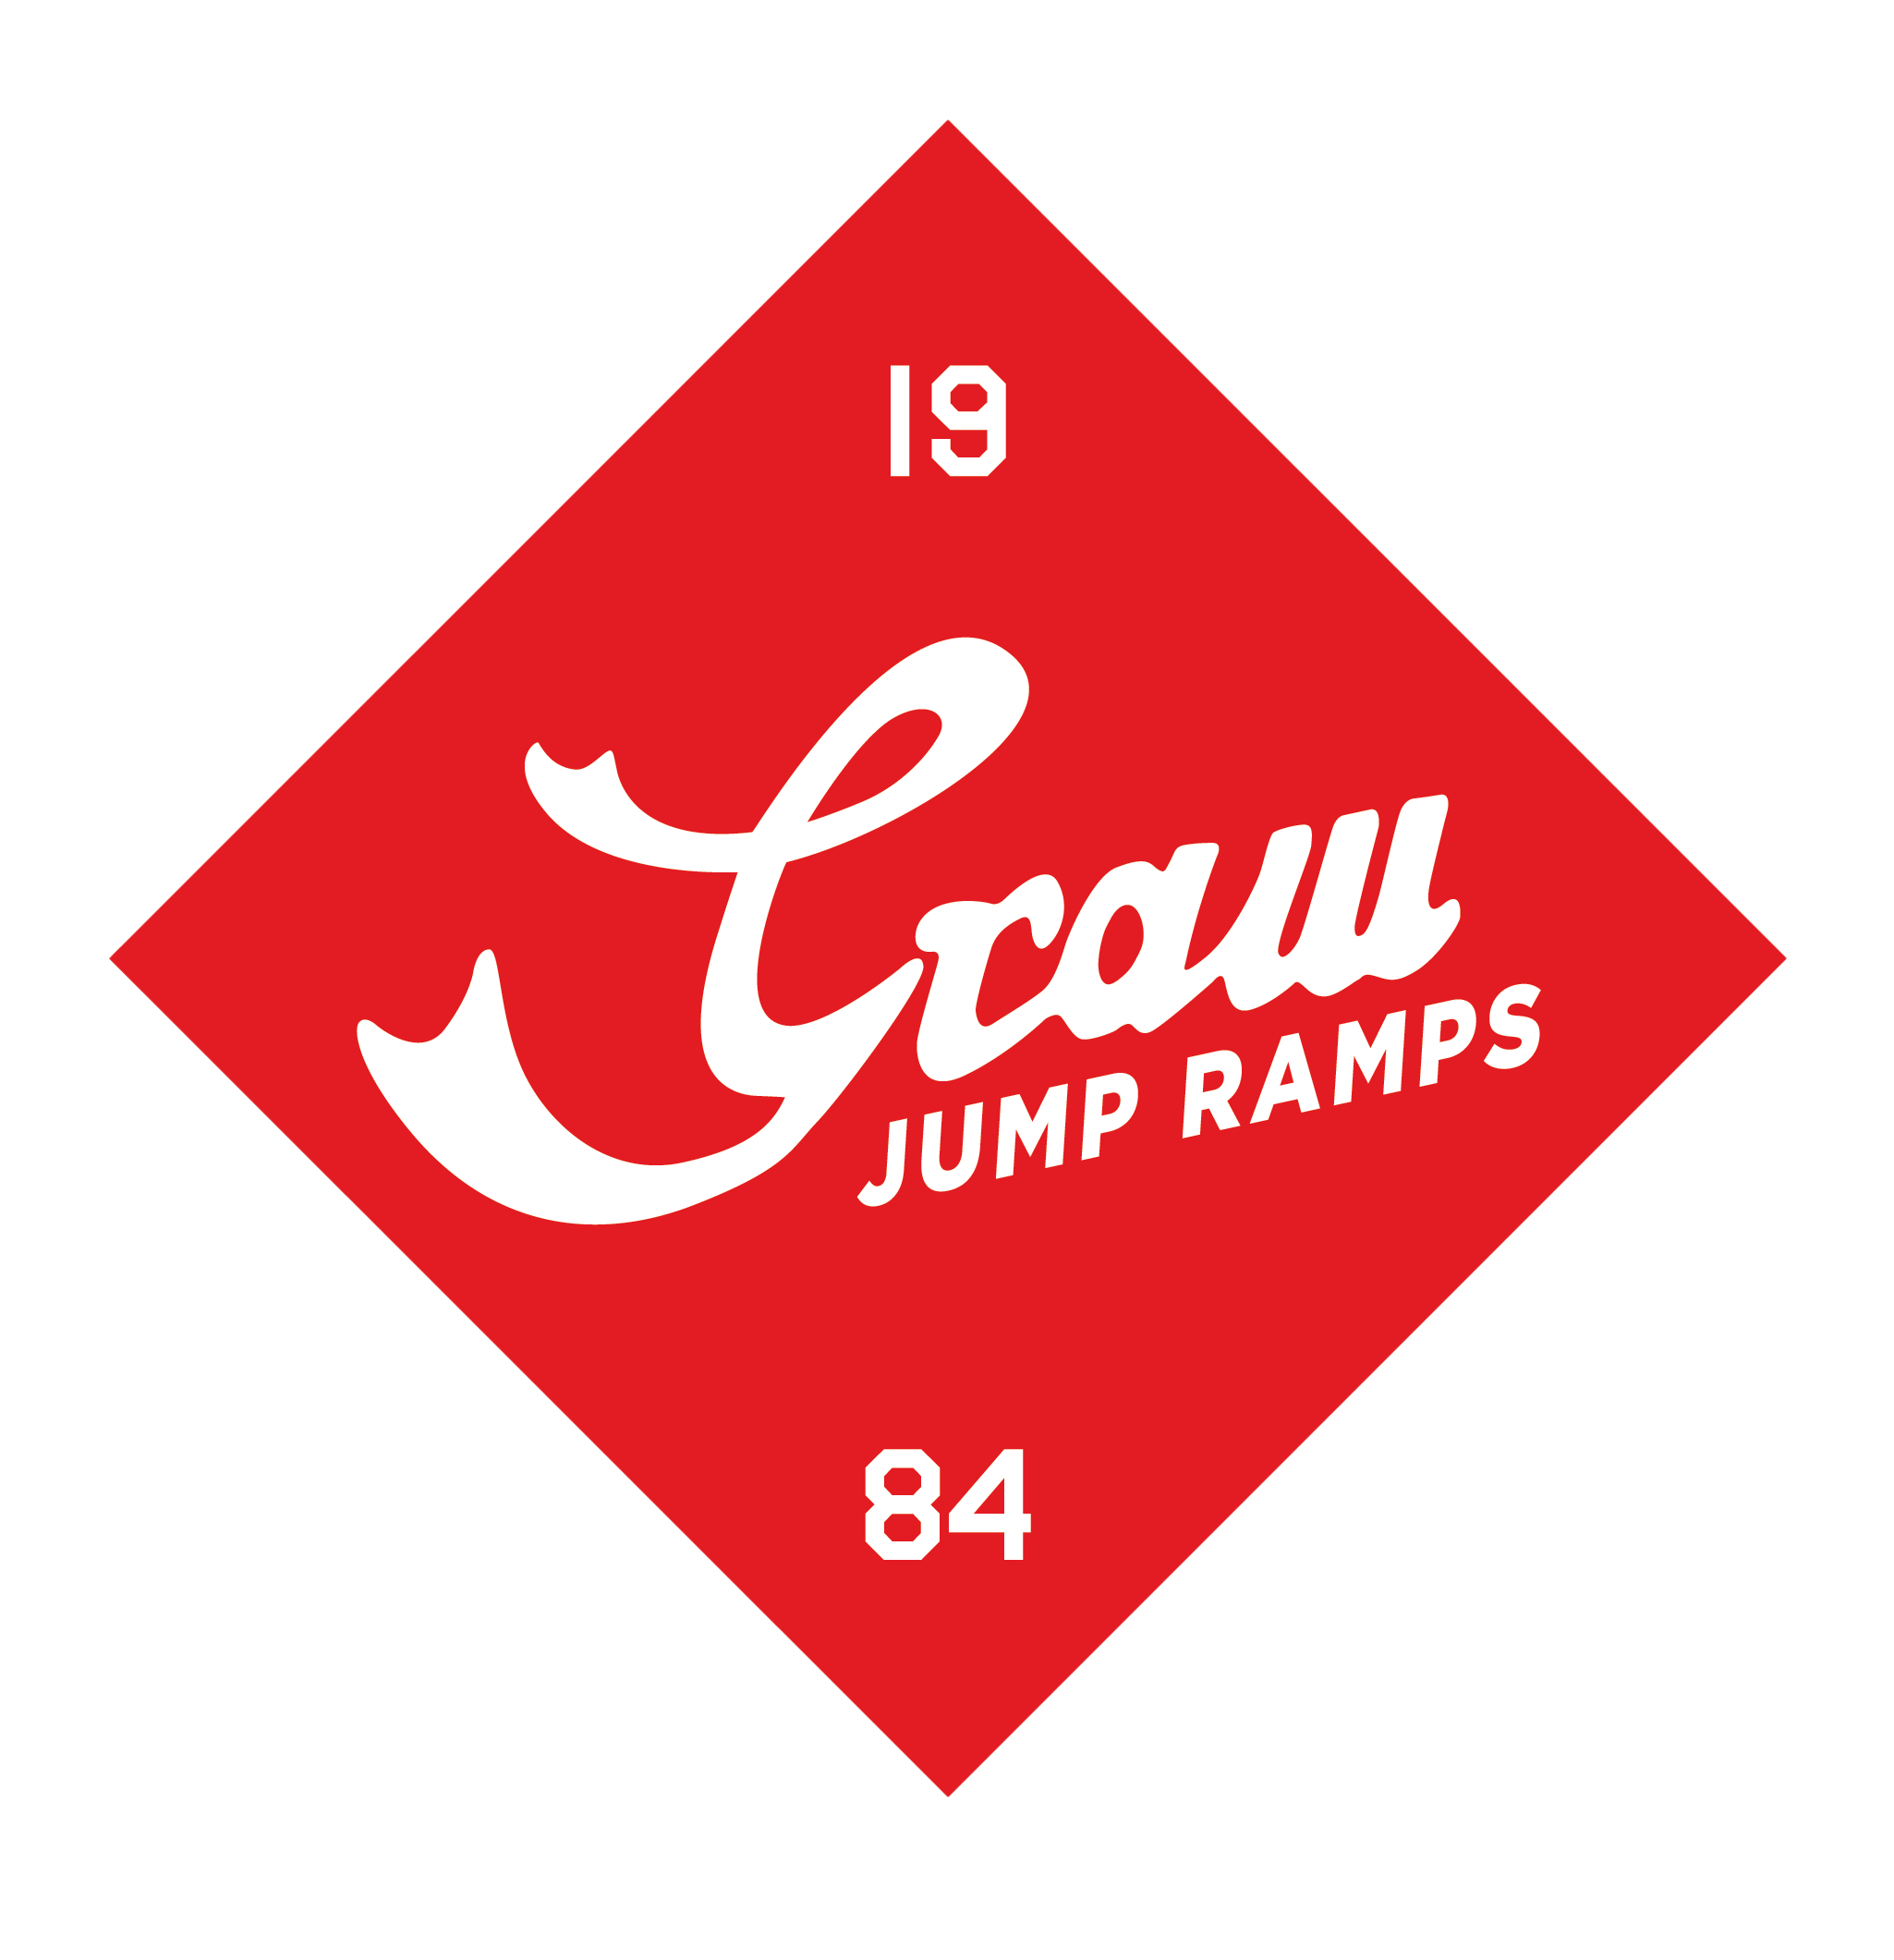 Graw Jump Ramps